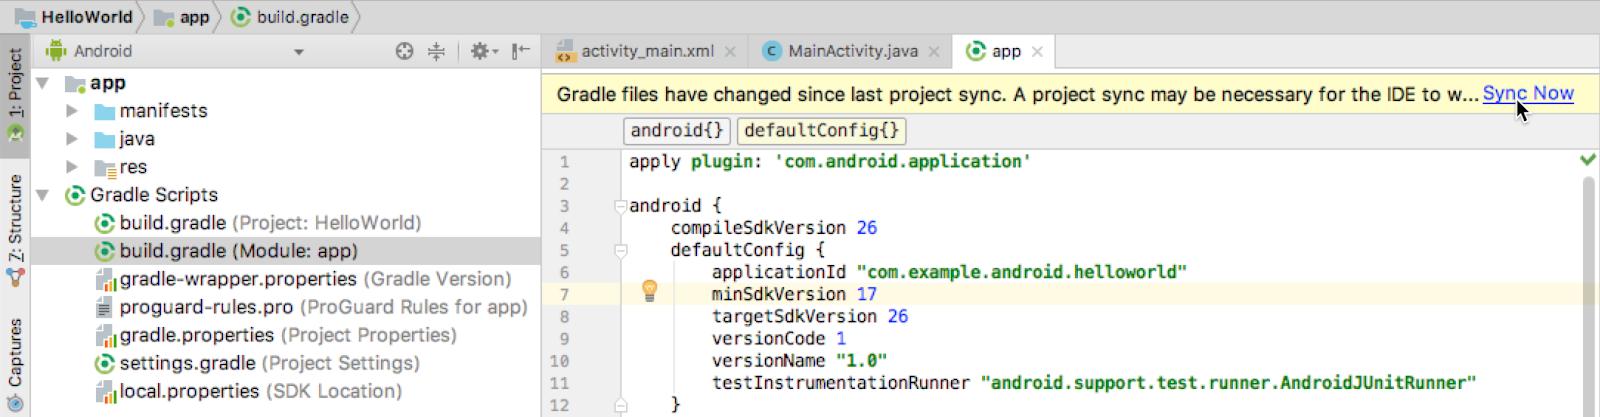 Changing the app Gradle configuration